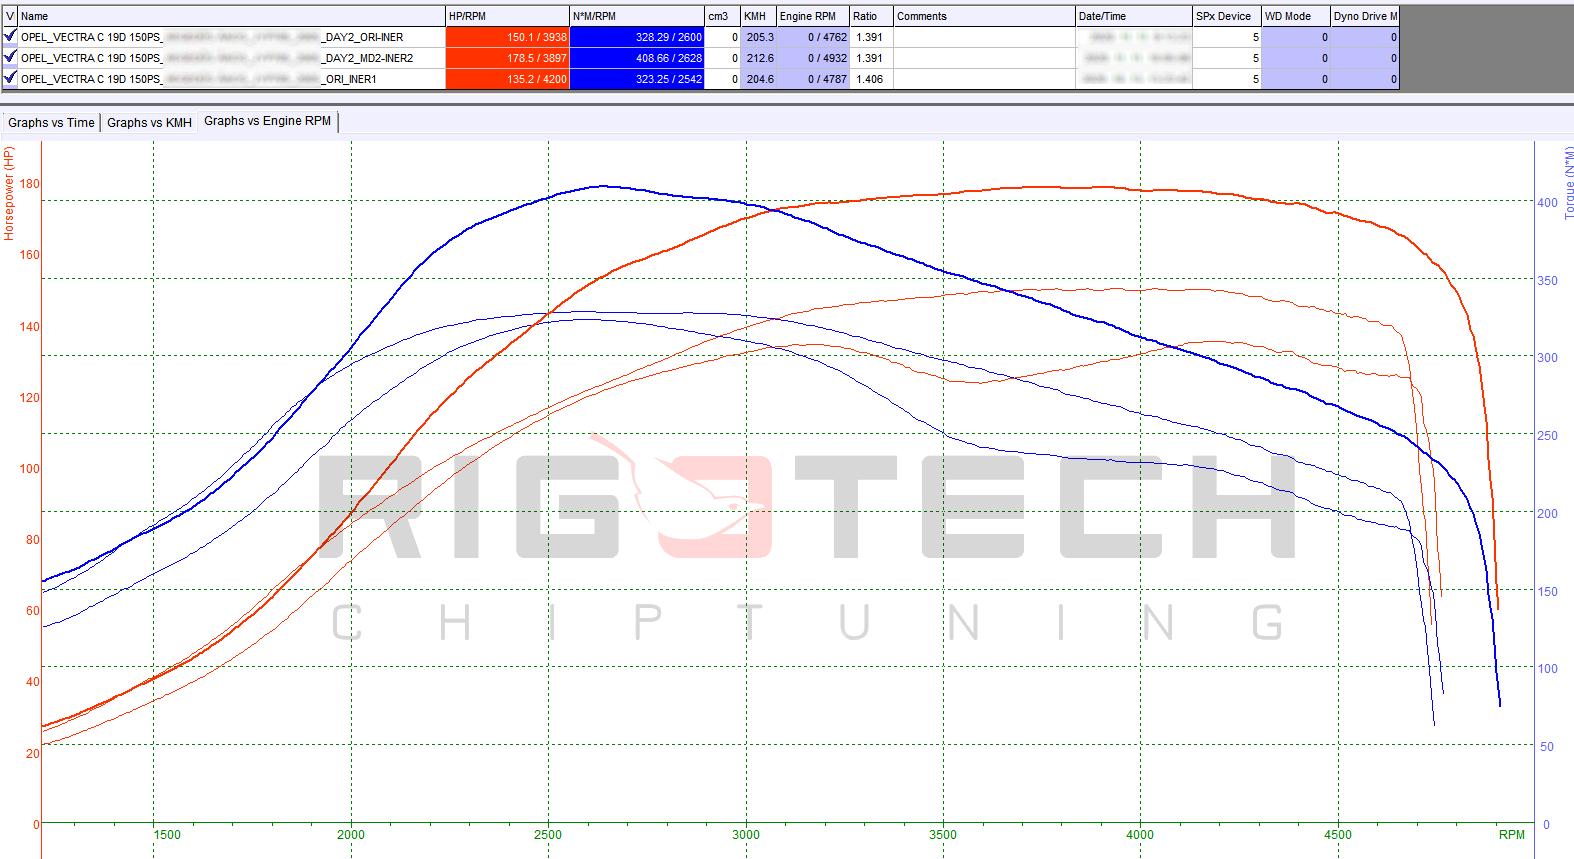 Opel_Vectra_c_19CDTI_150ps_2005_chiptuning-mod-chart-teljesitmenymeres